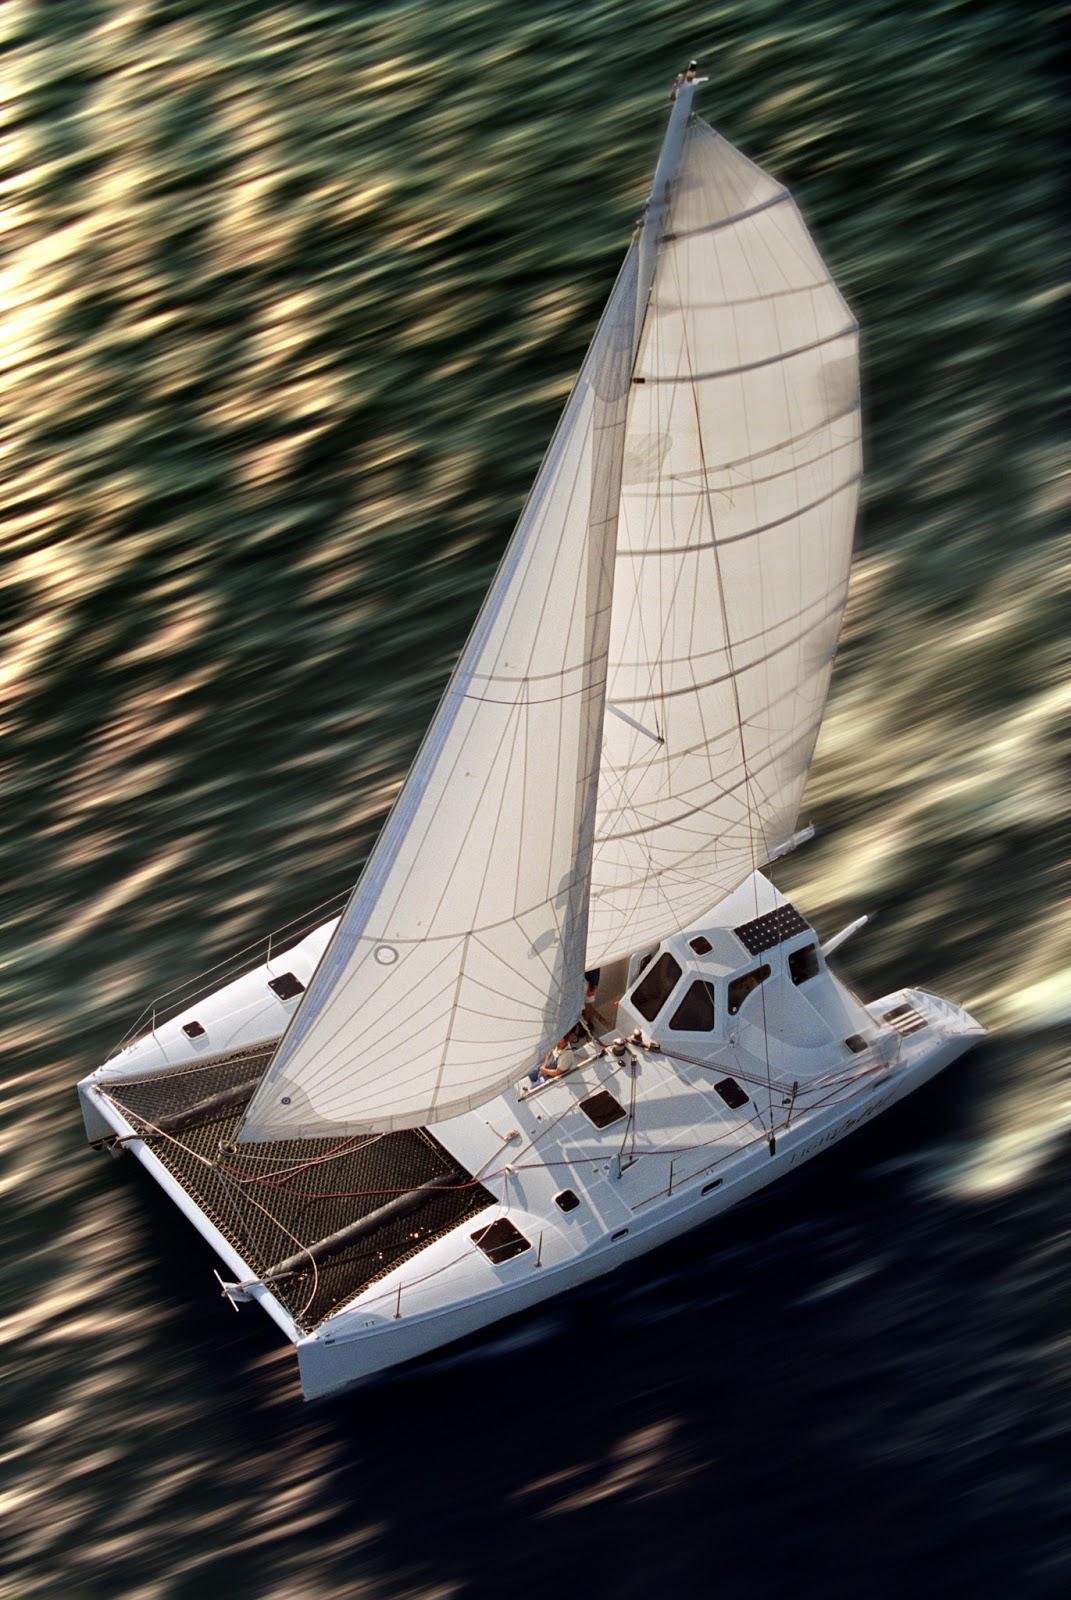 For Sale: Chris White Atlantic 42 performance cruising